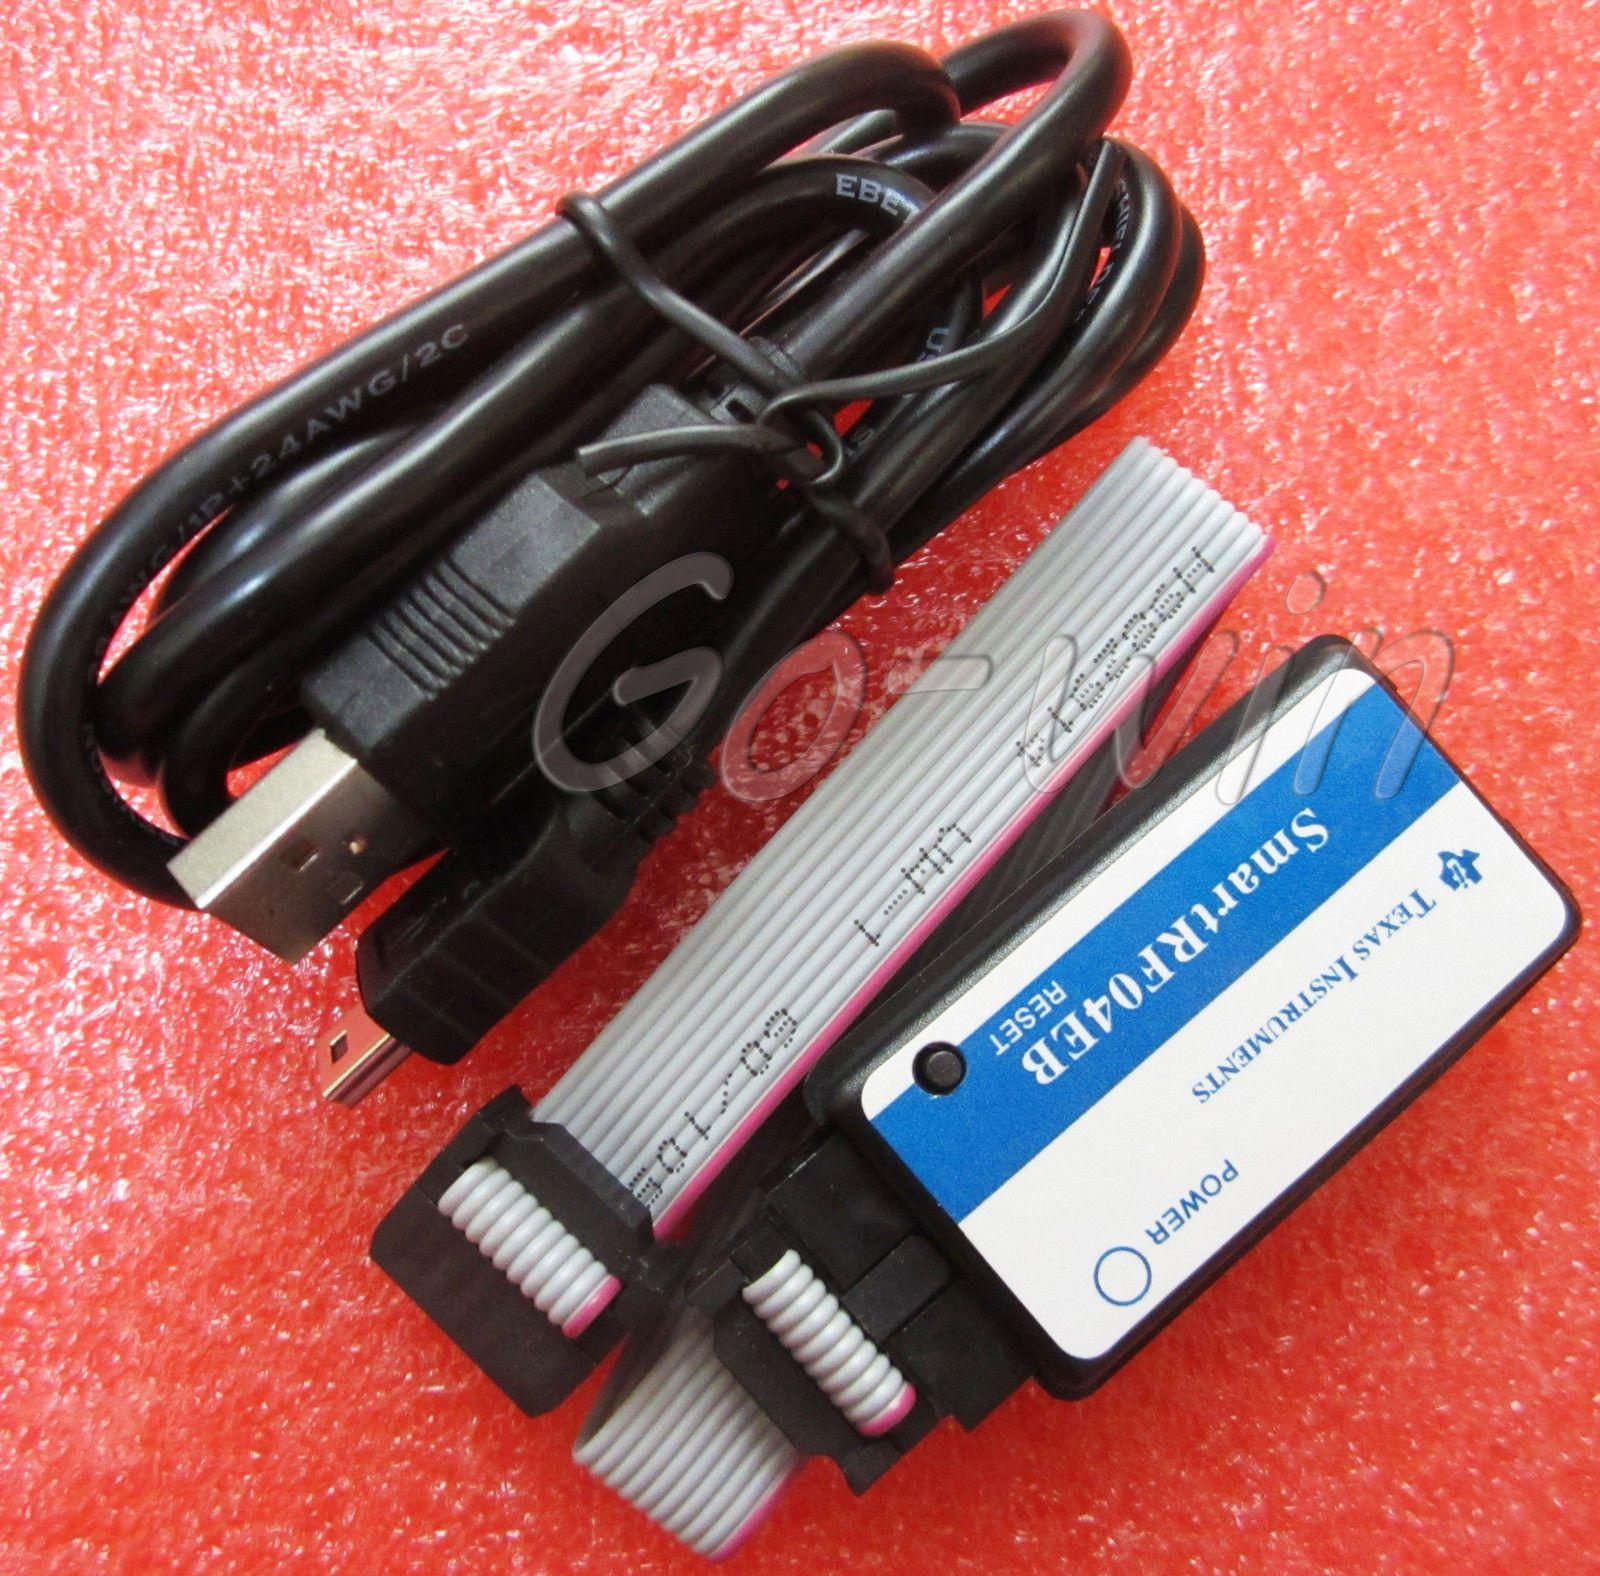 $9 36 - Smartrf04Eb Cc1110 Cc2530 Zigbee Module Usb